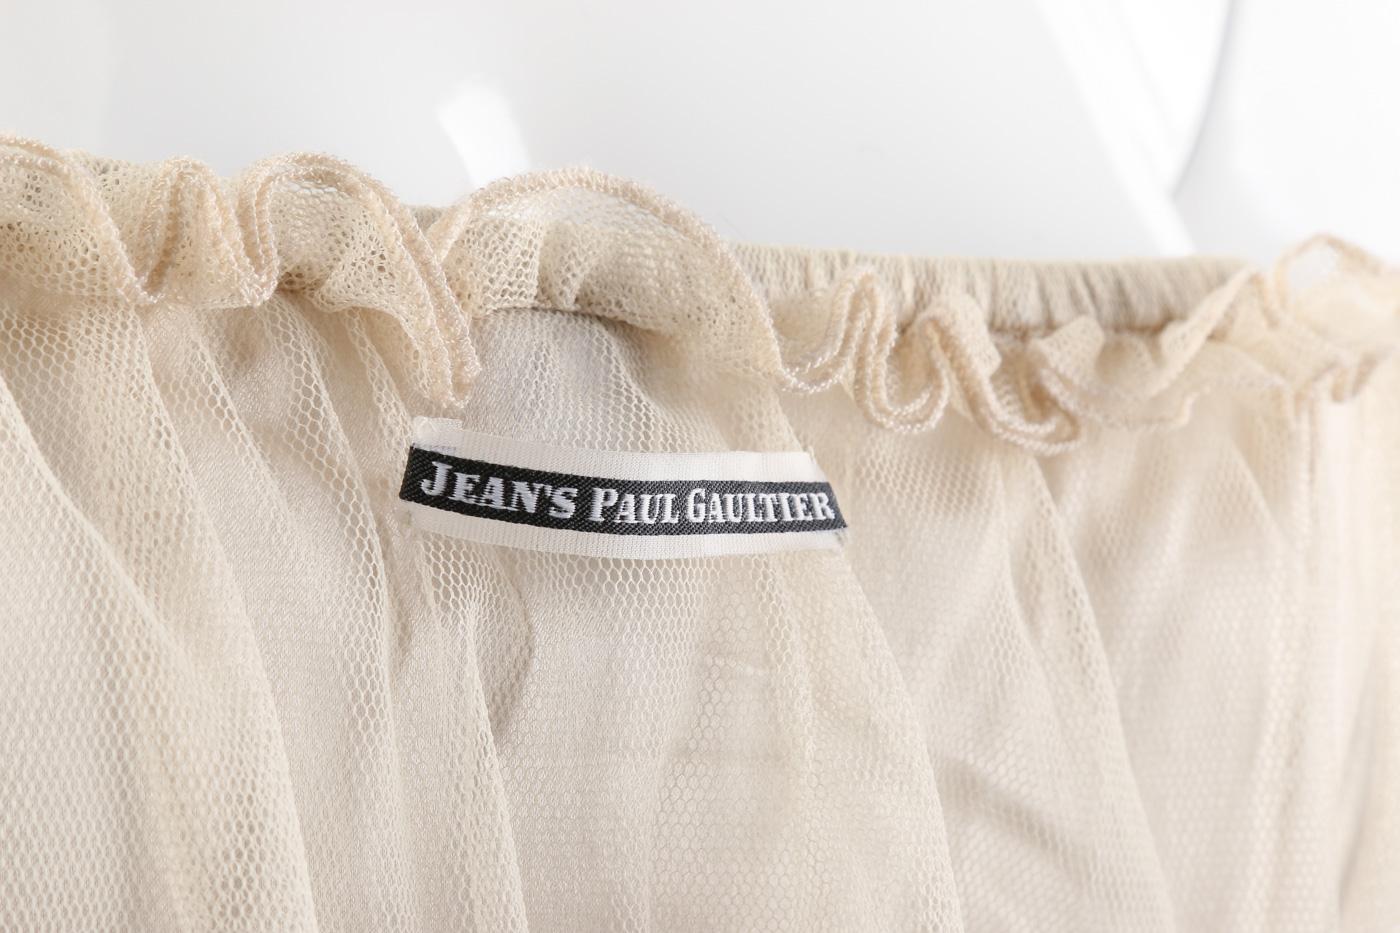 Jean Paul Gaultier. Corsage. Str. M